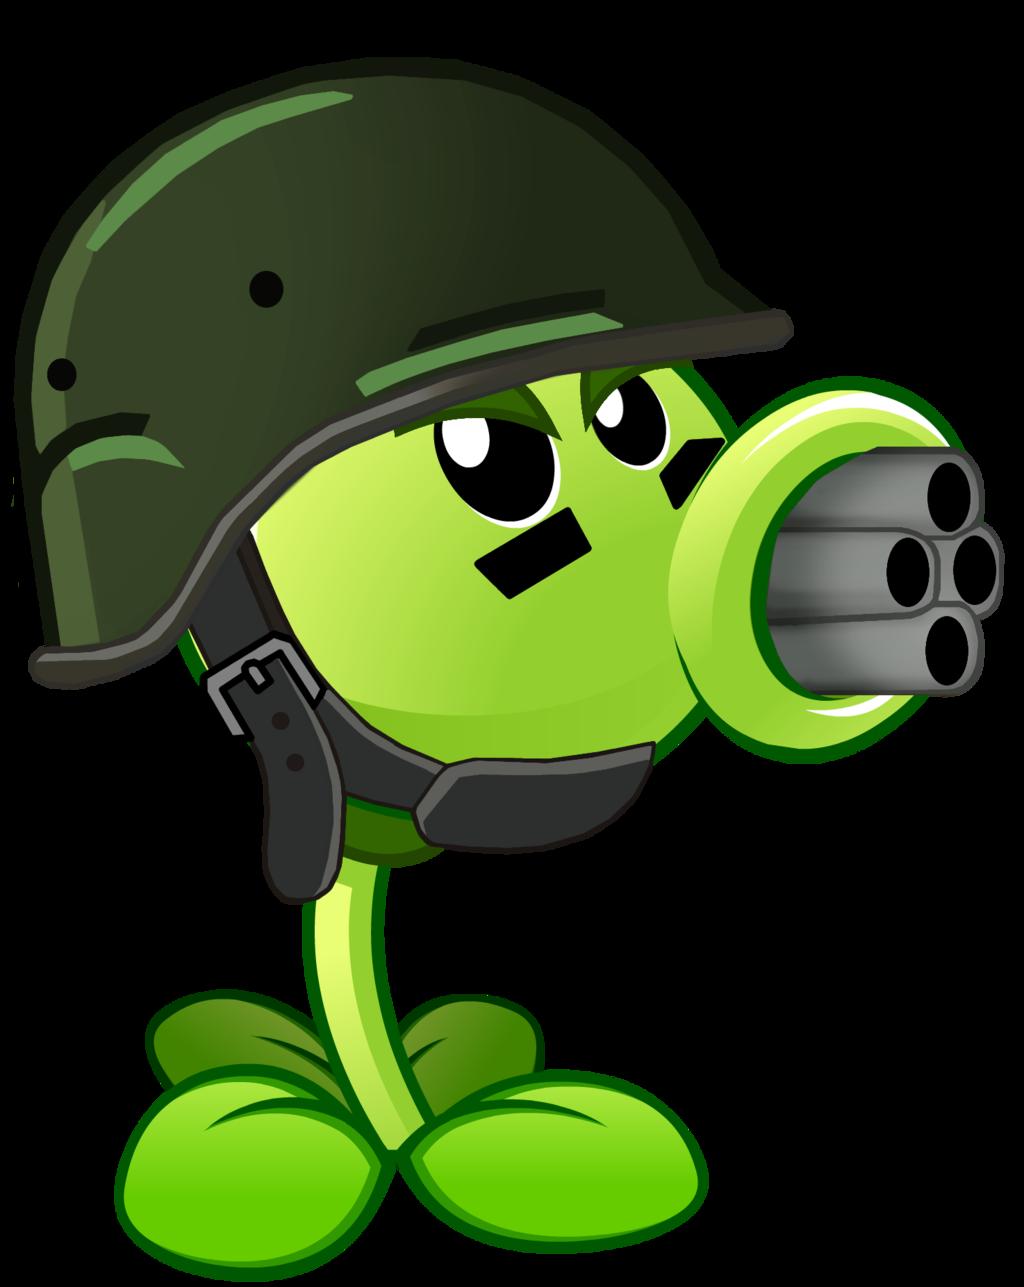 Zombie clipart group zombie. Plants vs zombies iat